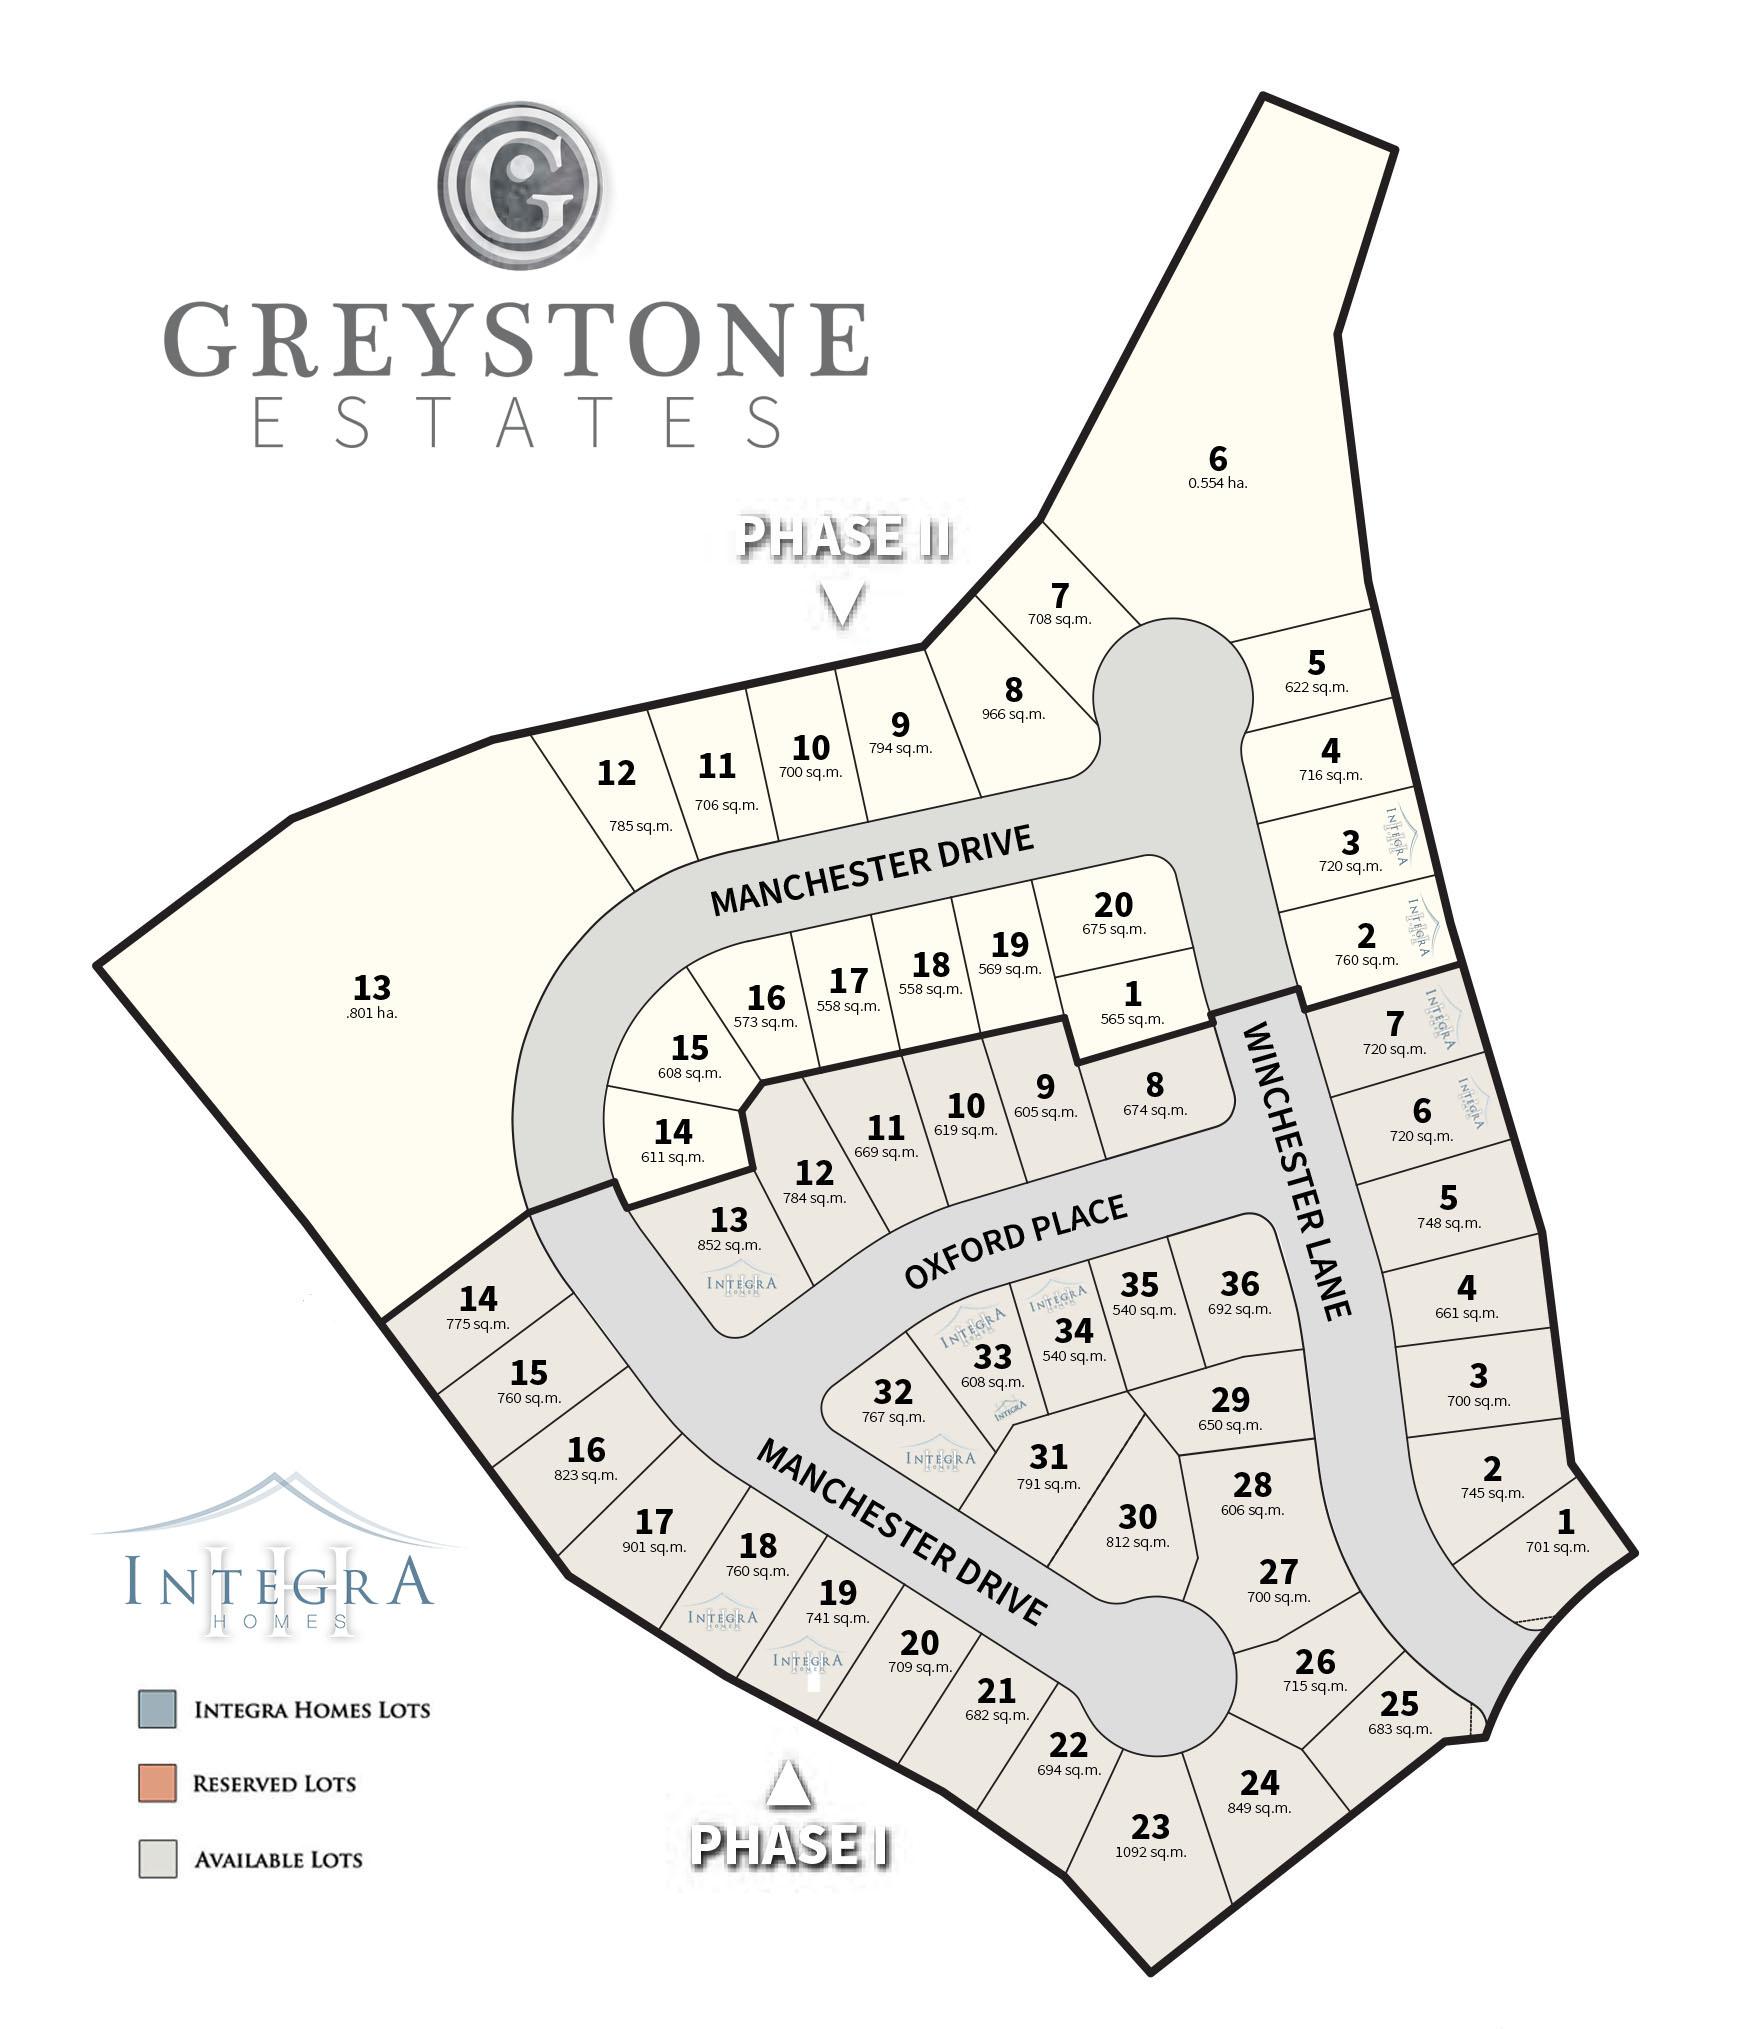 Greystone Estates